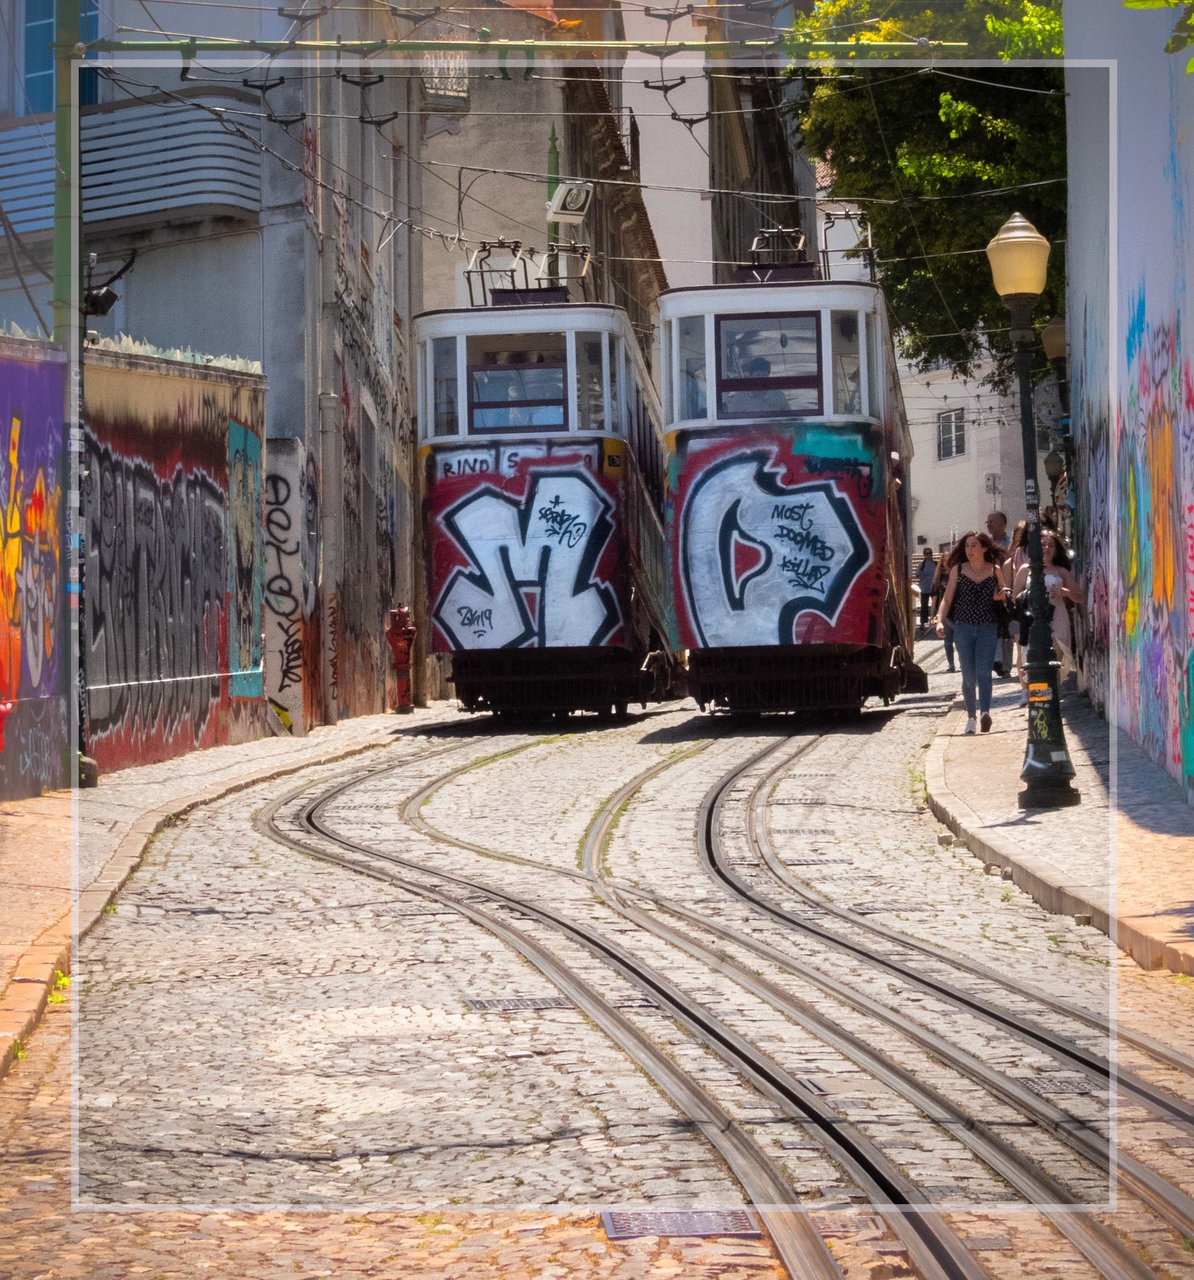 Photo in Travels | Author doctoraaa | PHOTO FORUM